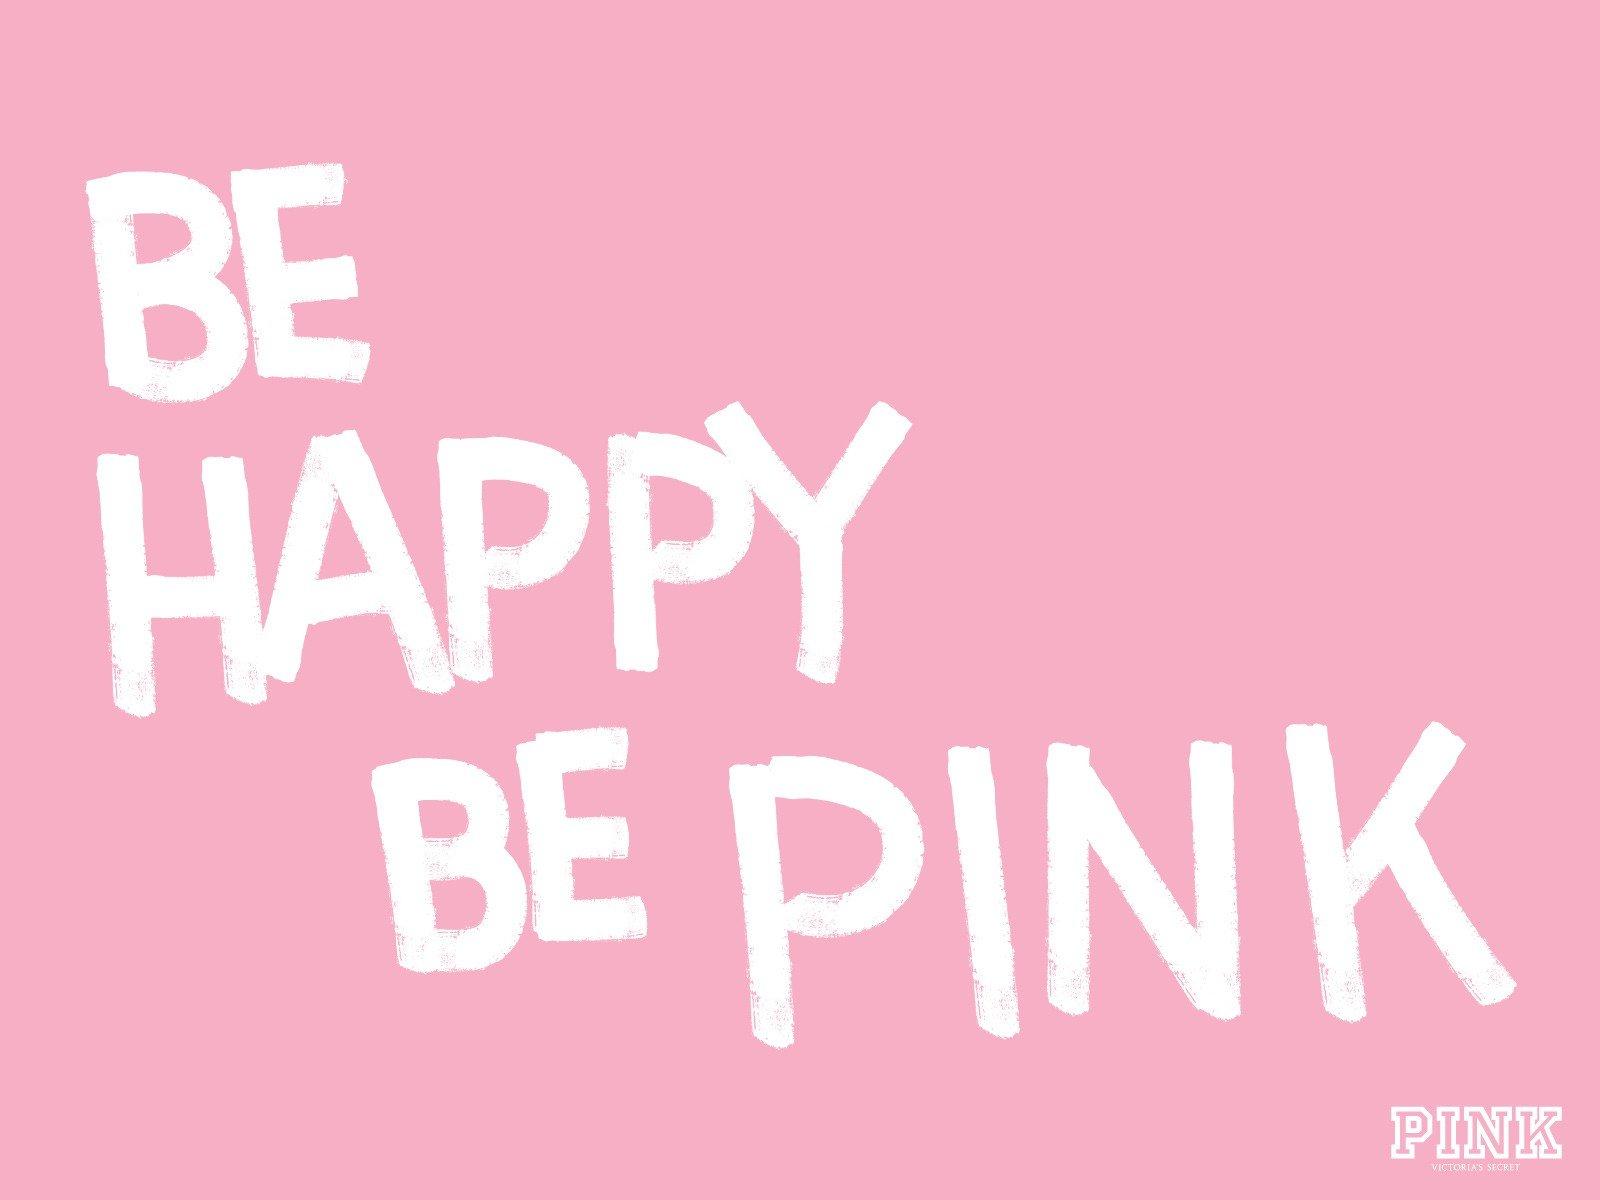 Pink Victoria Secret iPhone Wallpapers - WallpaperSafari